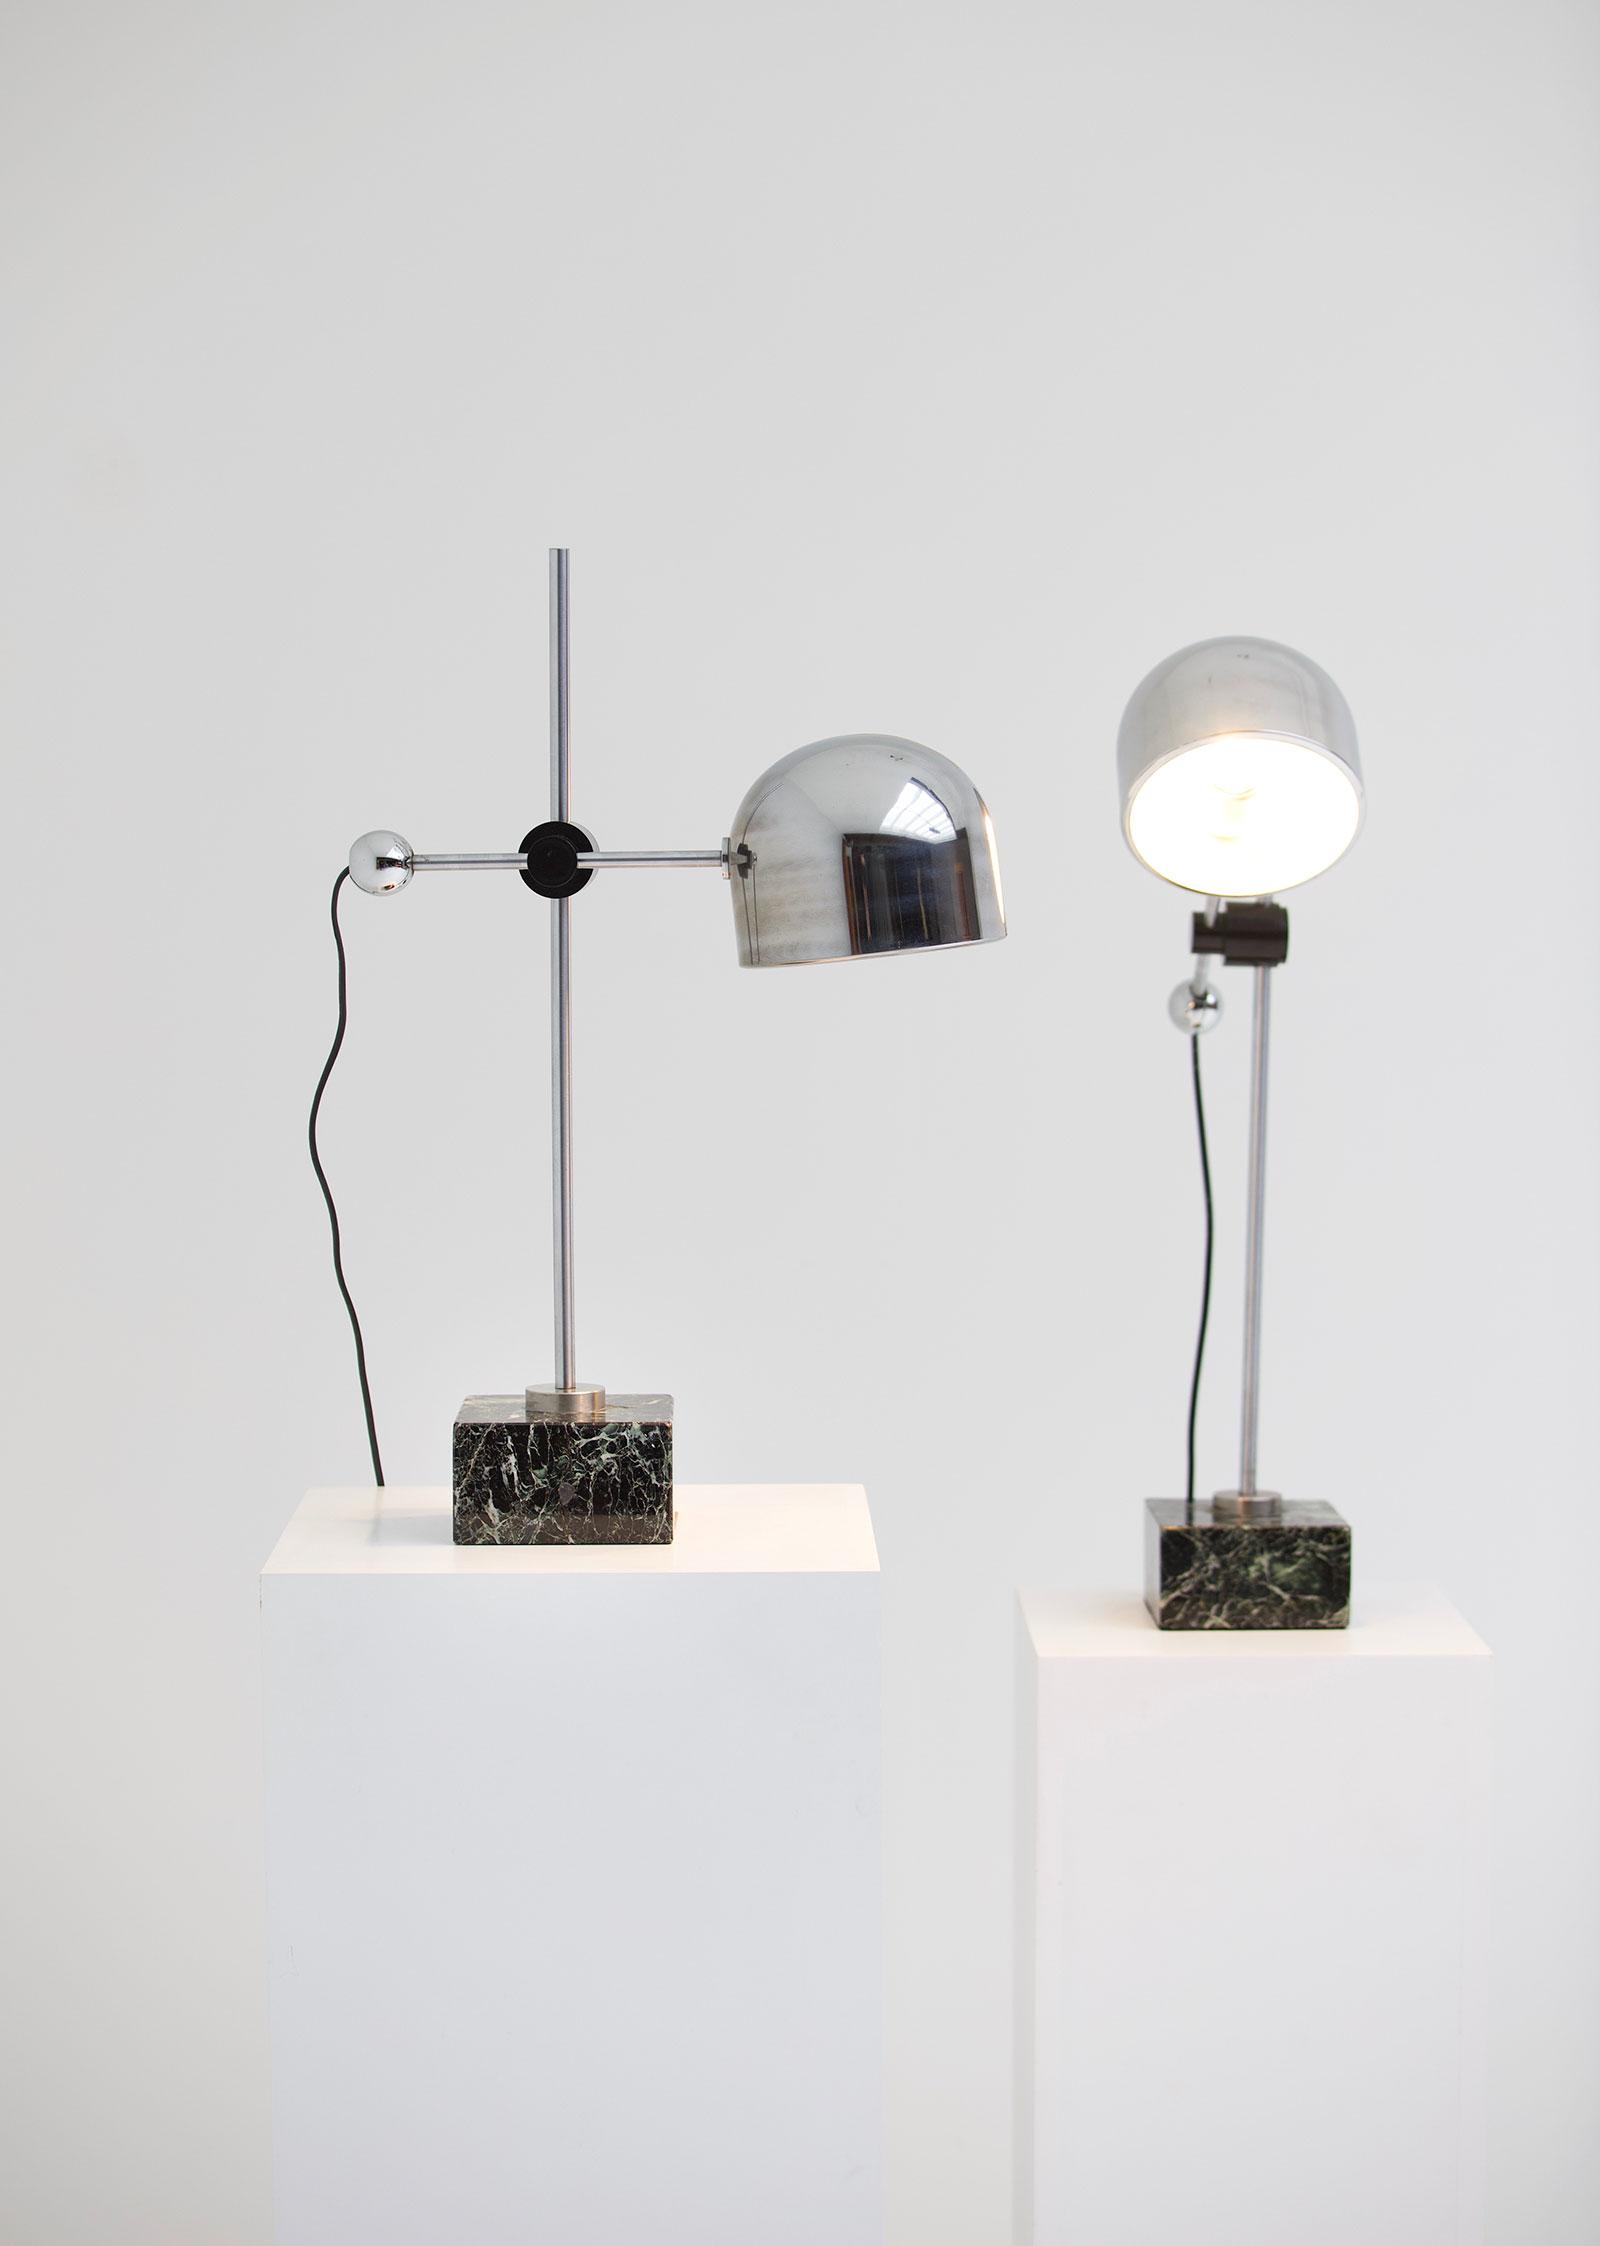 Barcelona Lumm Chrome Lamps